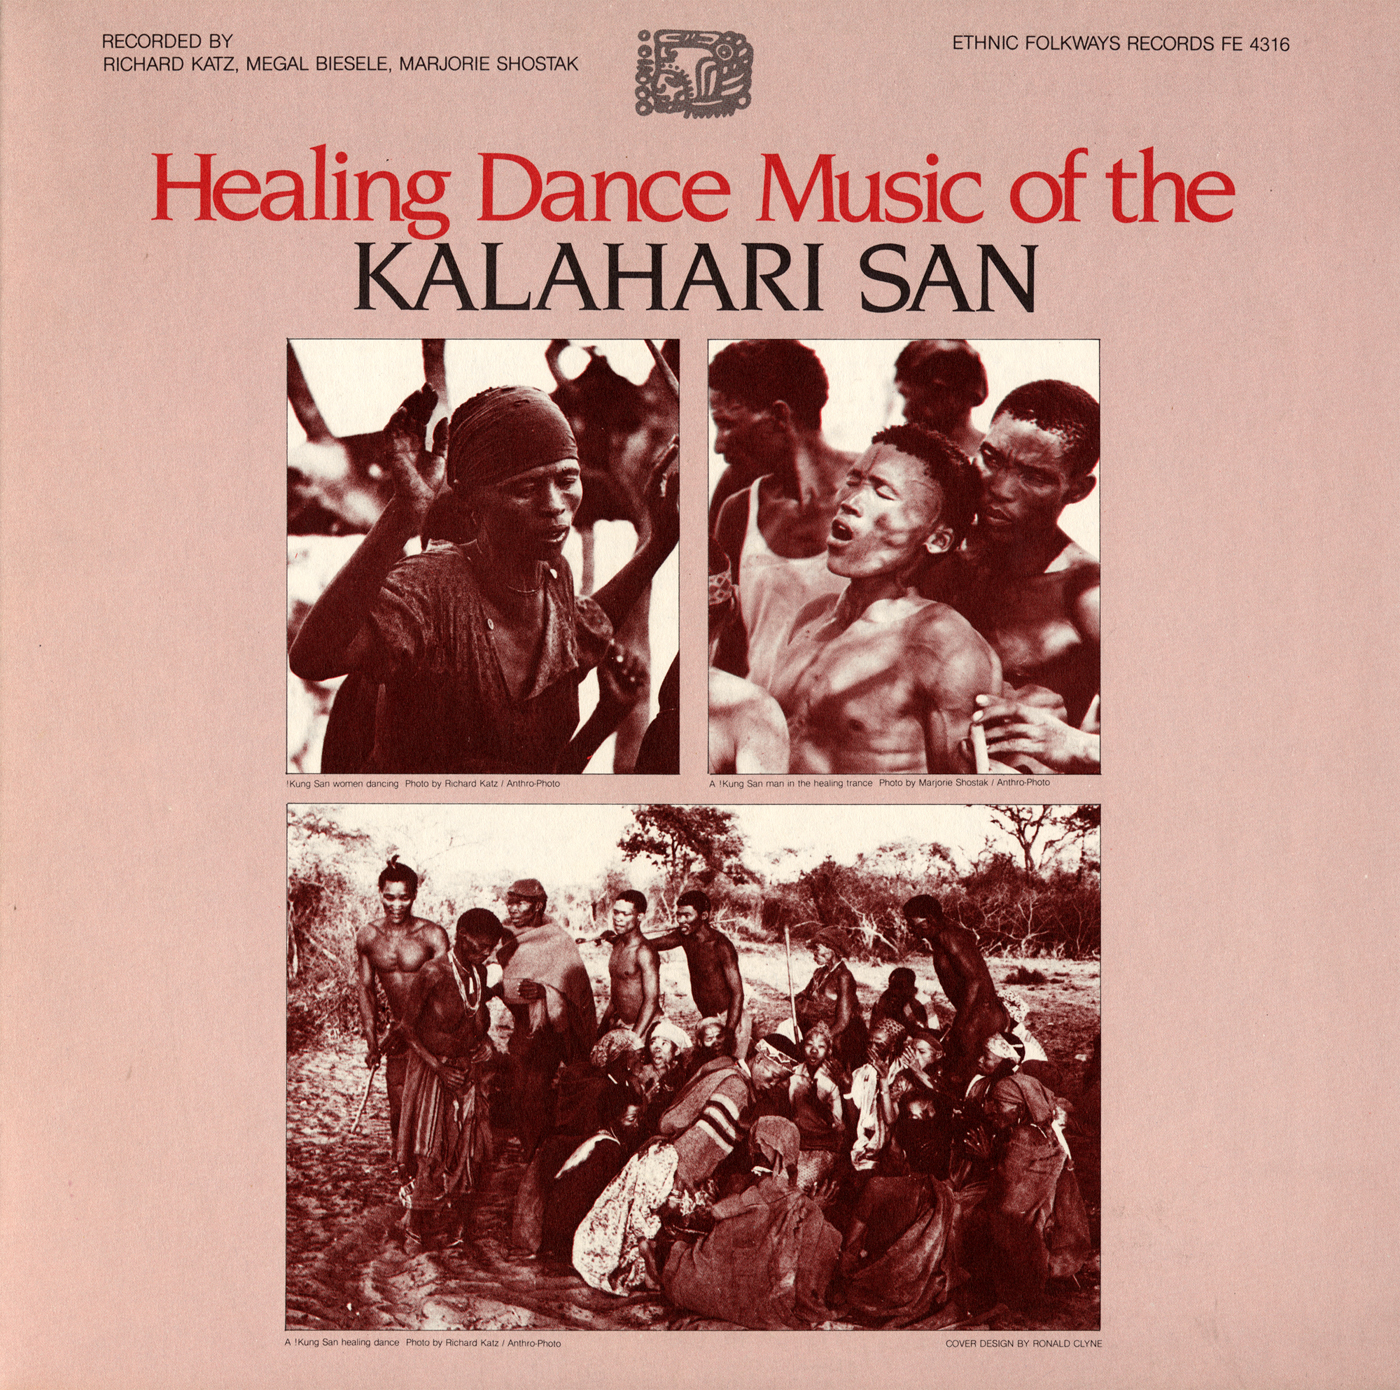 Healing Dance Music of the Kalahari San | Smithsonian